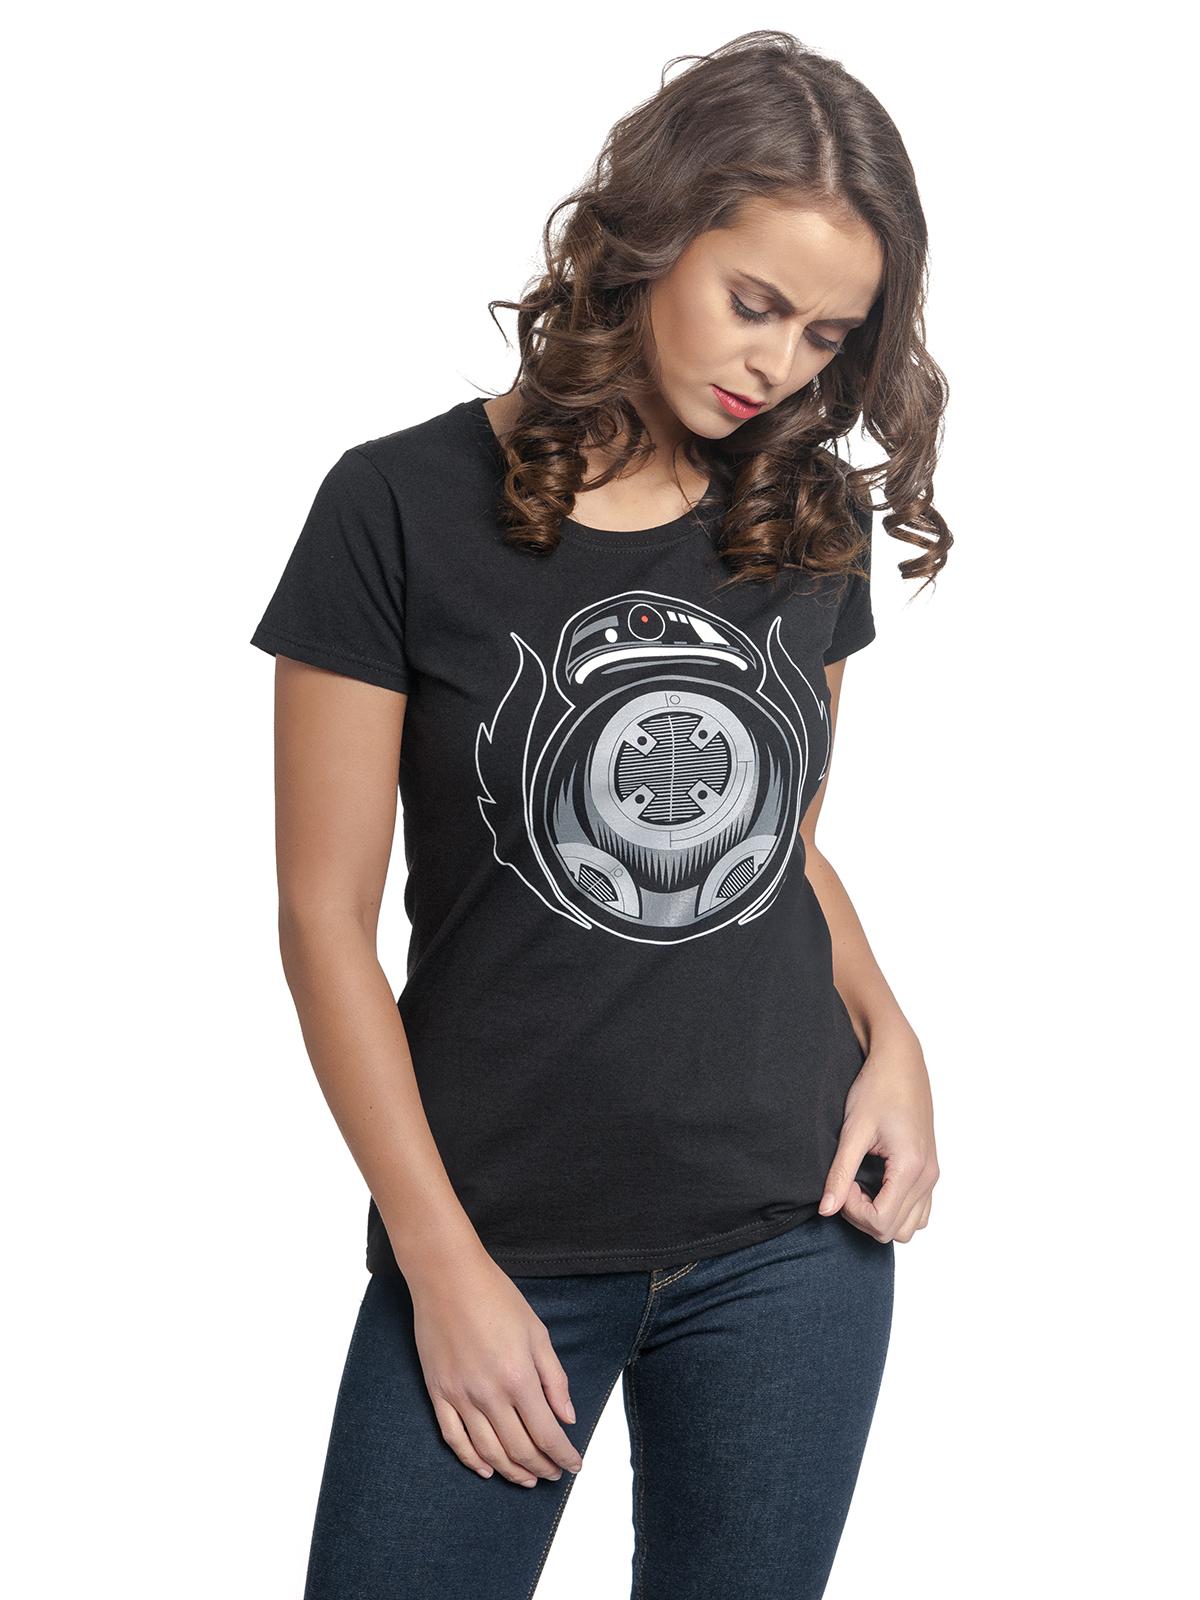 star wars badbb tee for women black women shirts tops. Black Bedroom Furniture Sets. Home Design Ideas